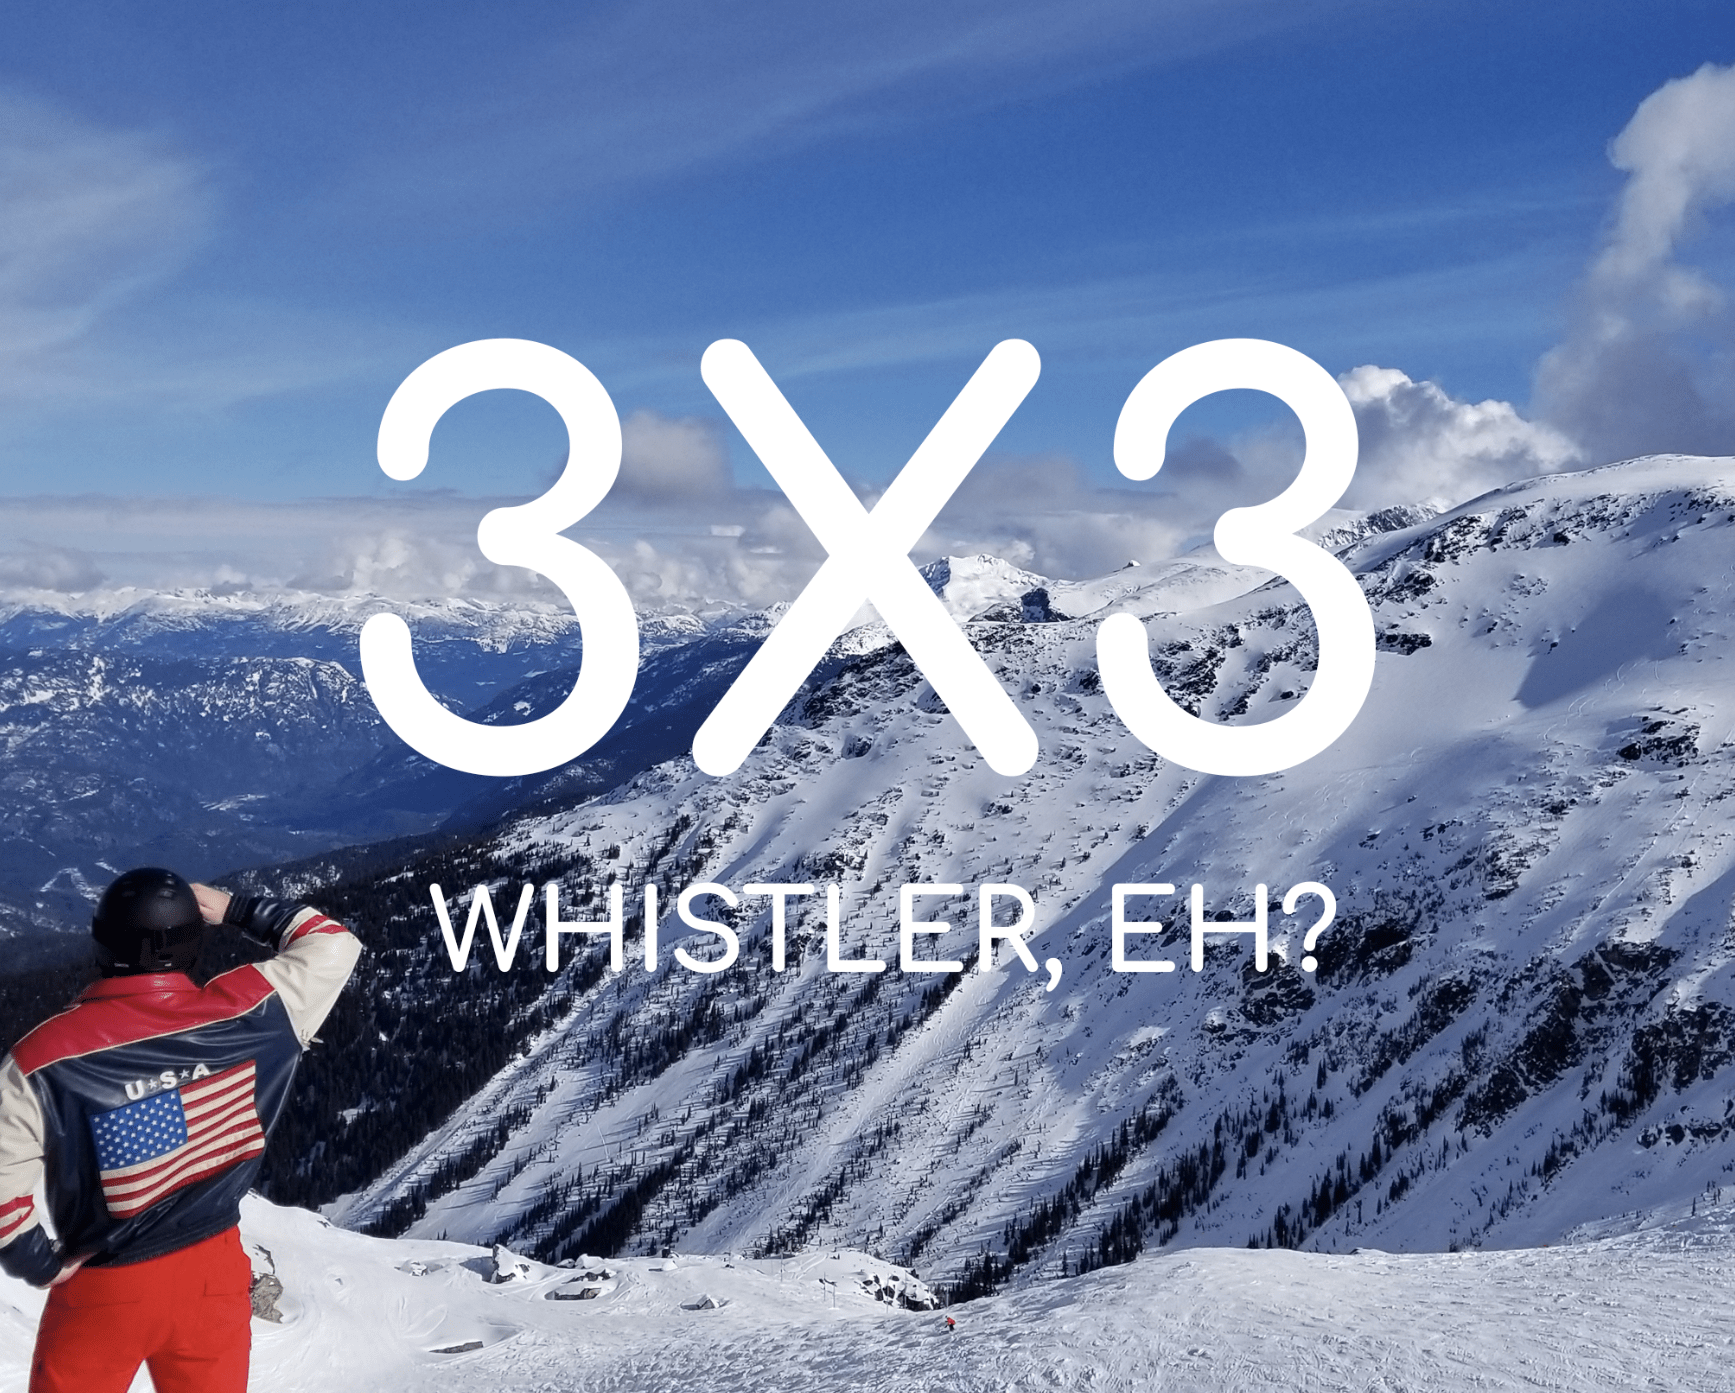 3X3: Whistler, Eh?